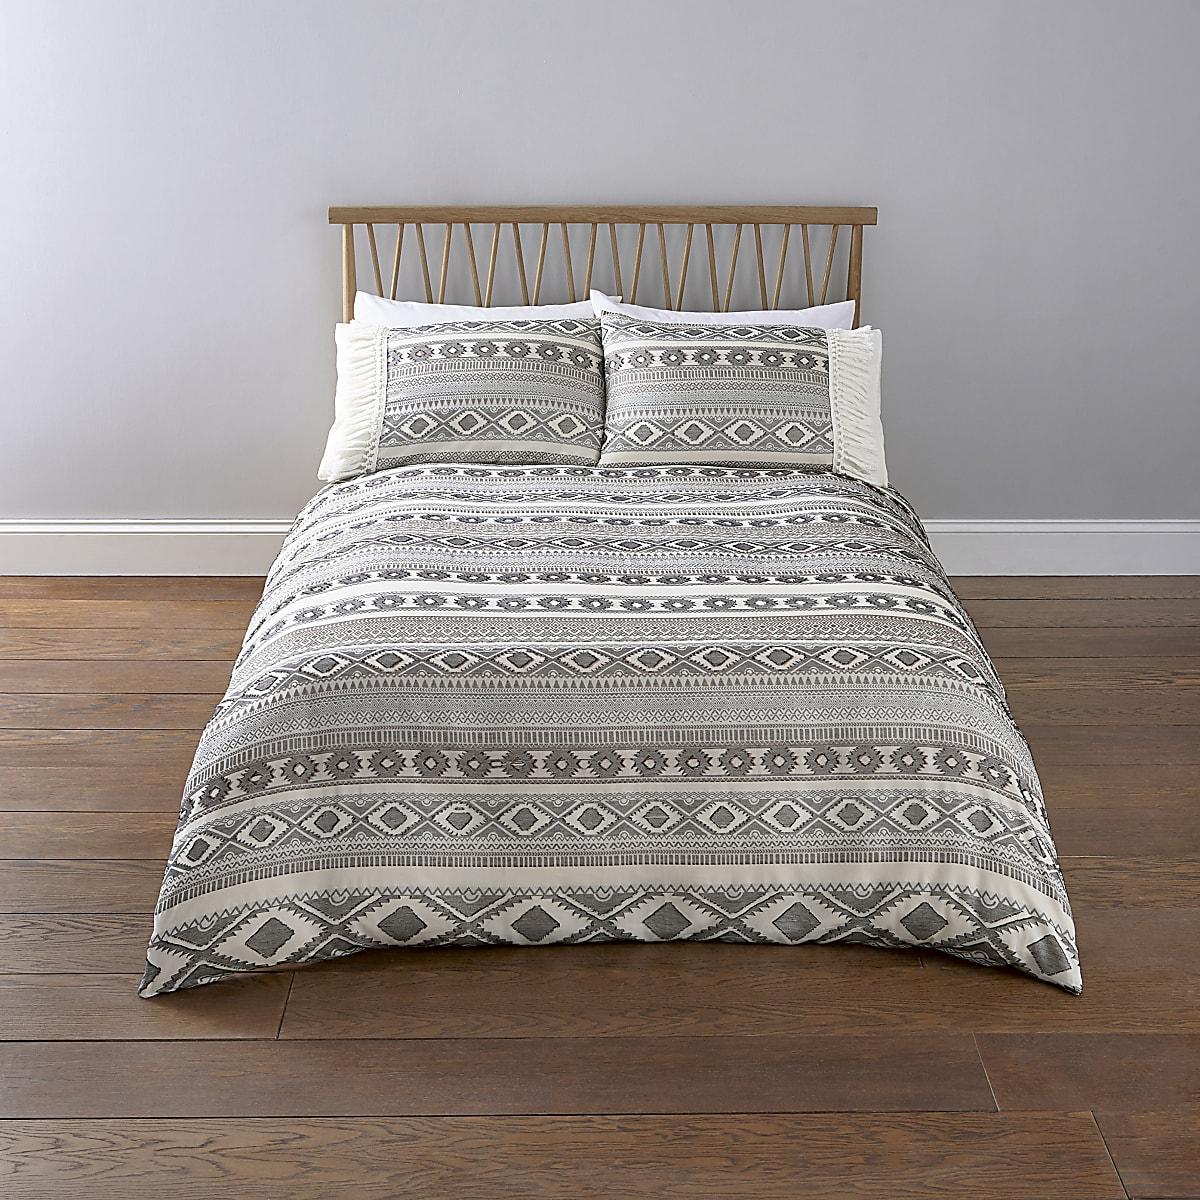 Cream Aztec jacquard super king duvet bed set